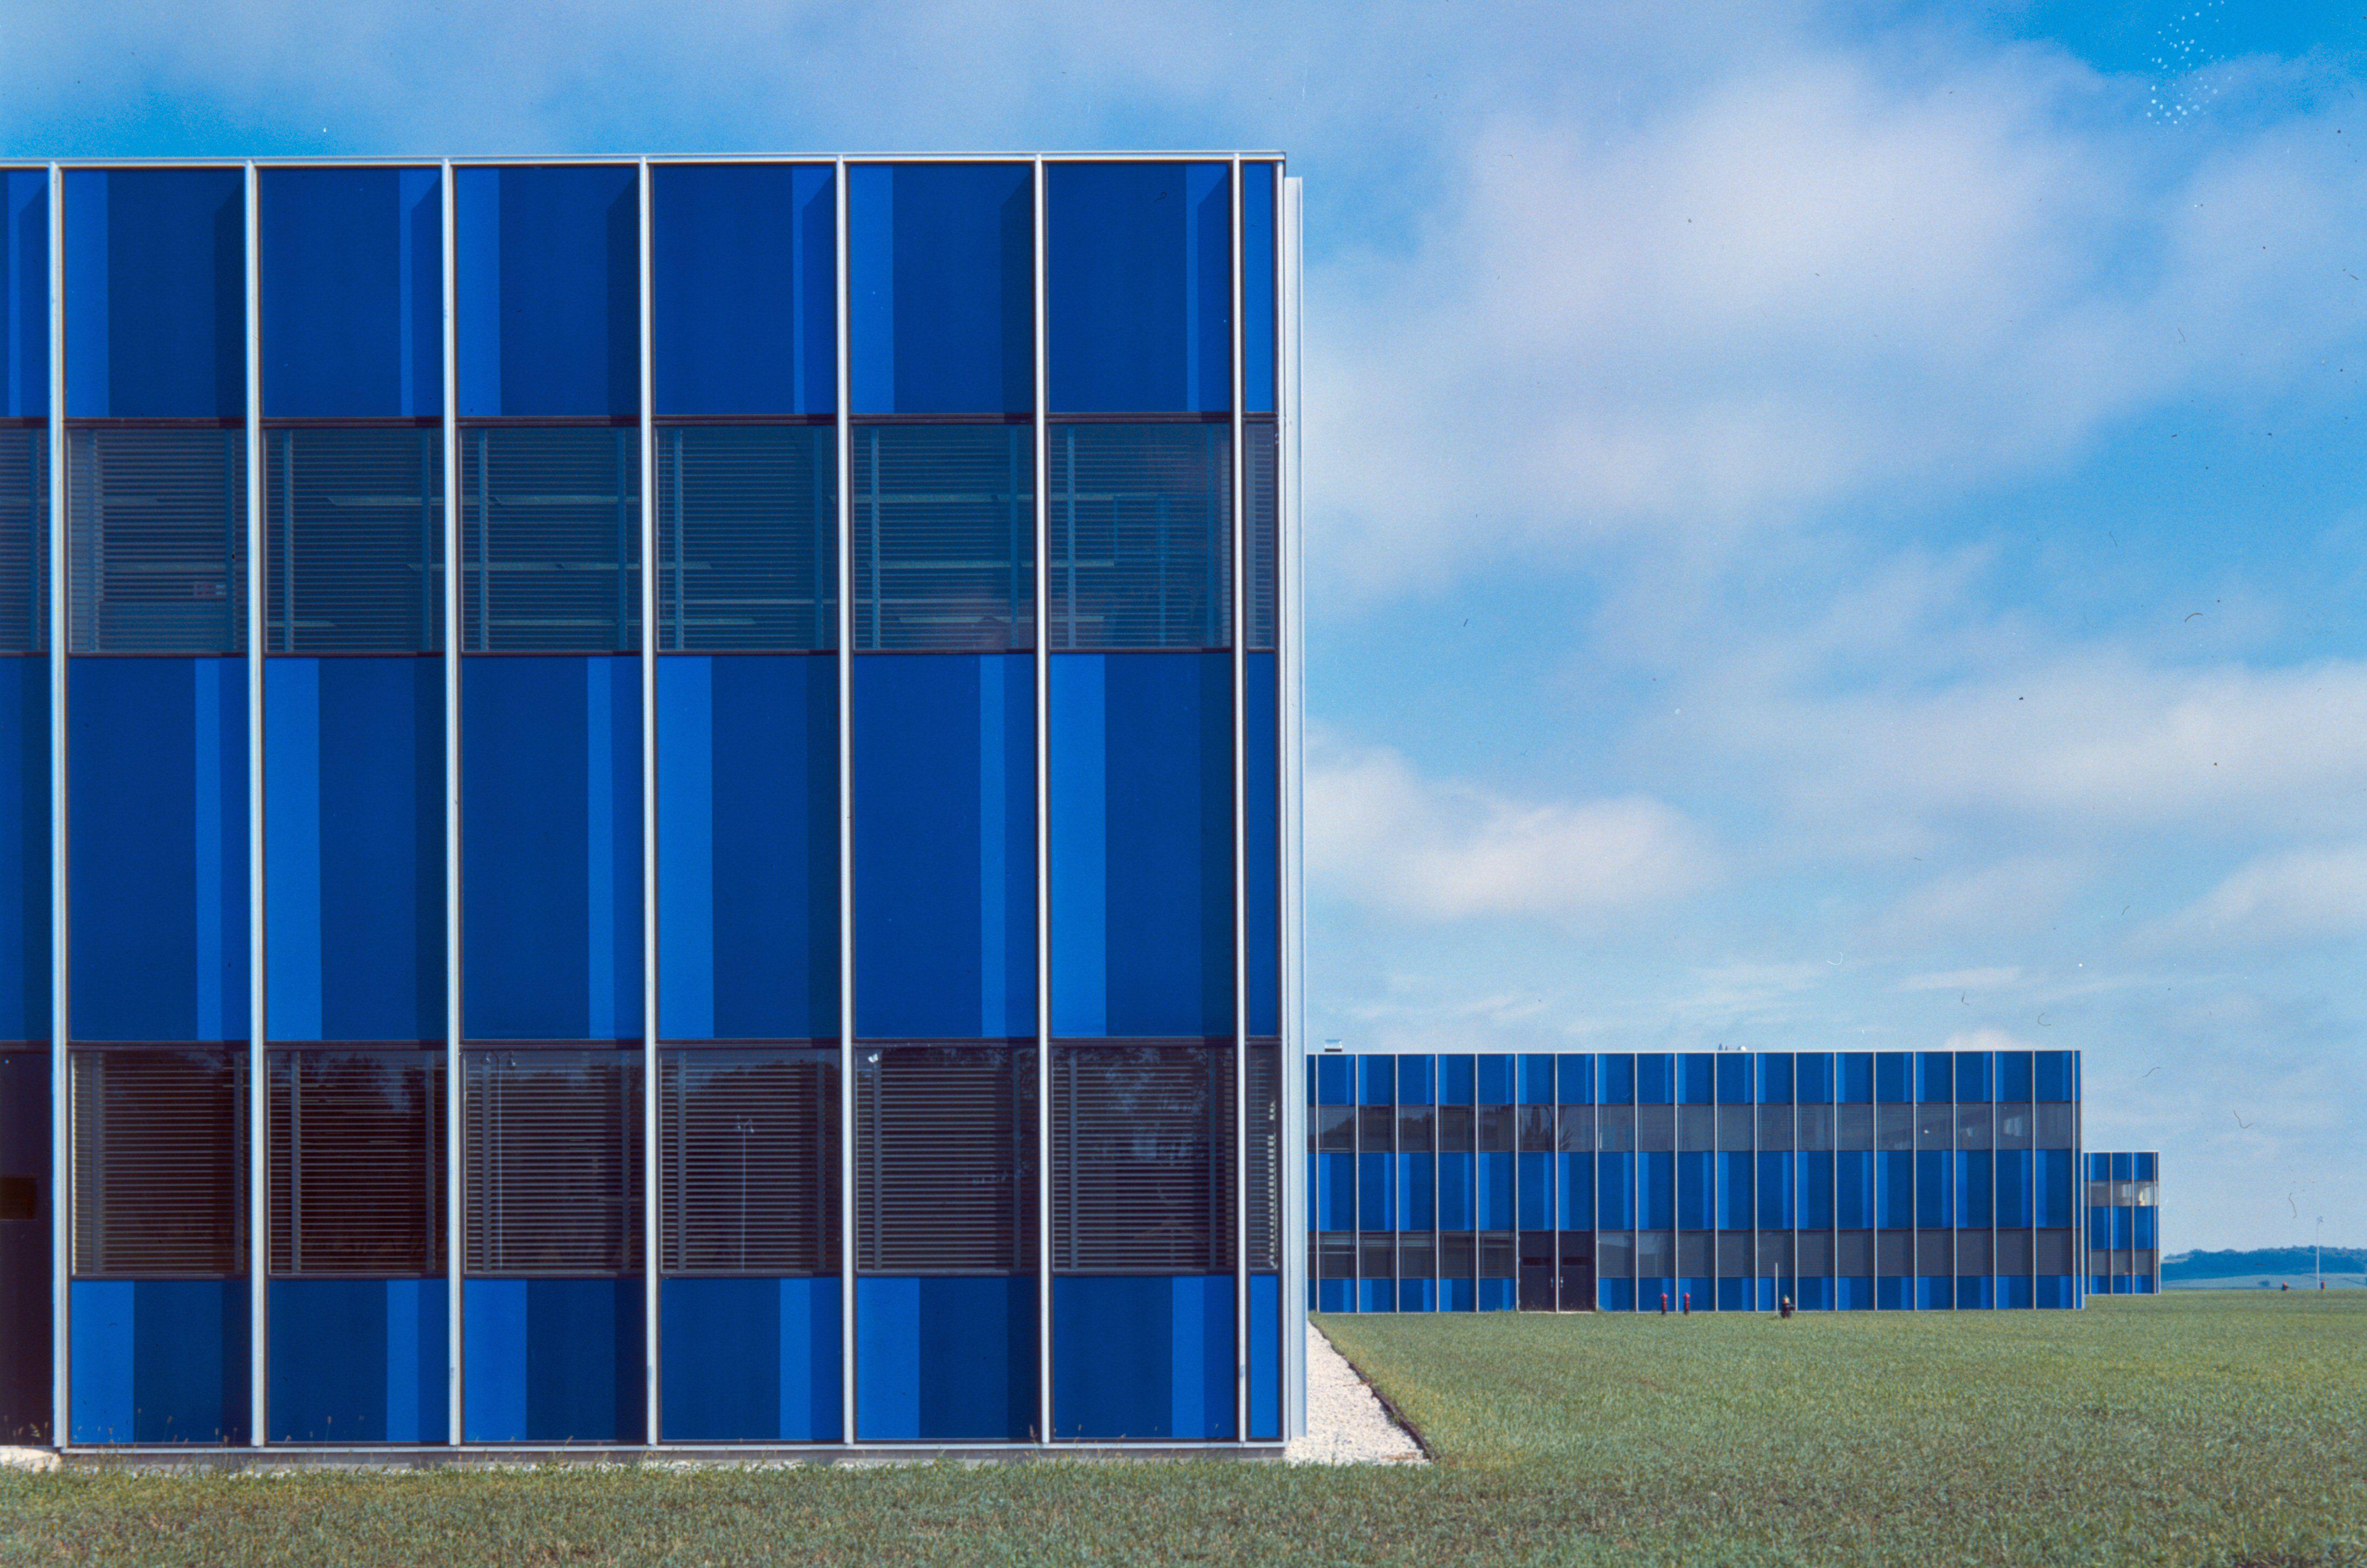 blue-tinted windows of Eero Saarinen-Designed IBM Center, Rochester, Minnesota, c. 1957